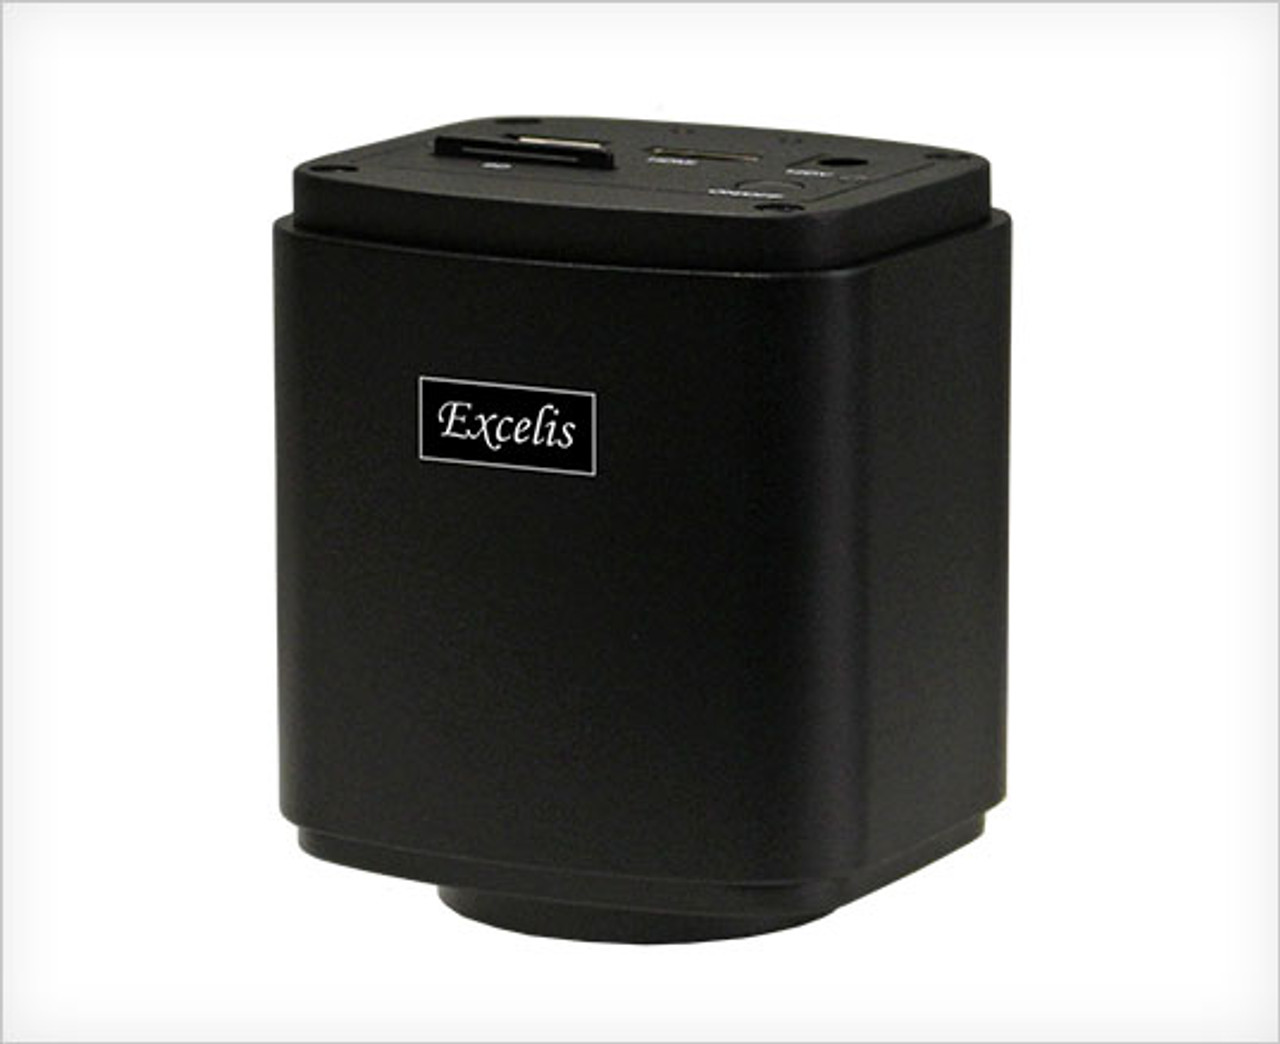 AU-600-HD-Excelis Camera